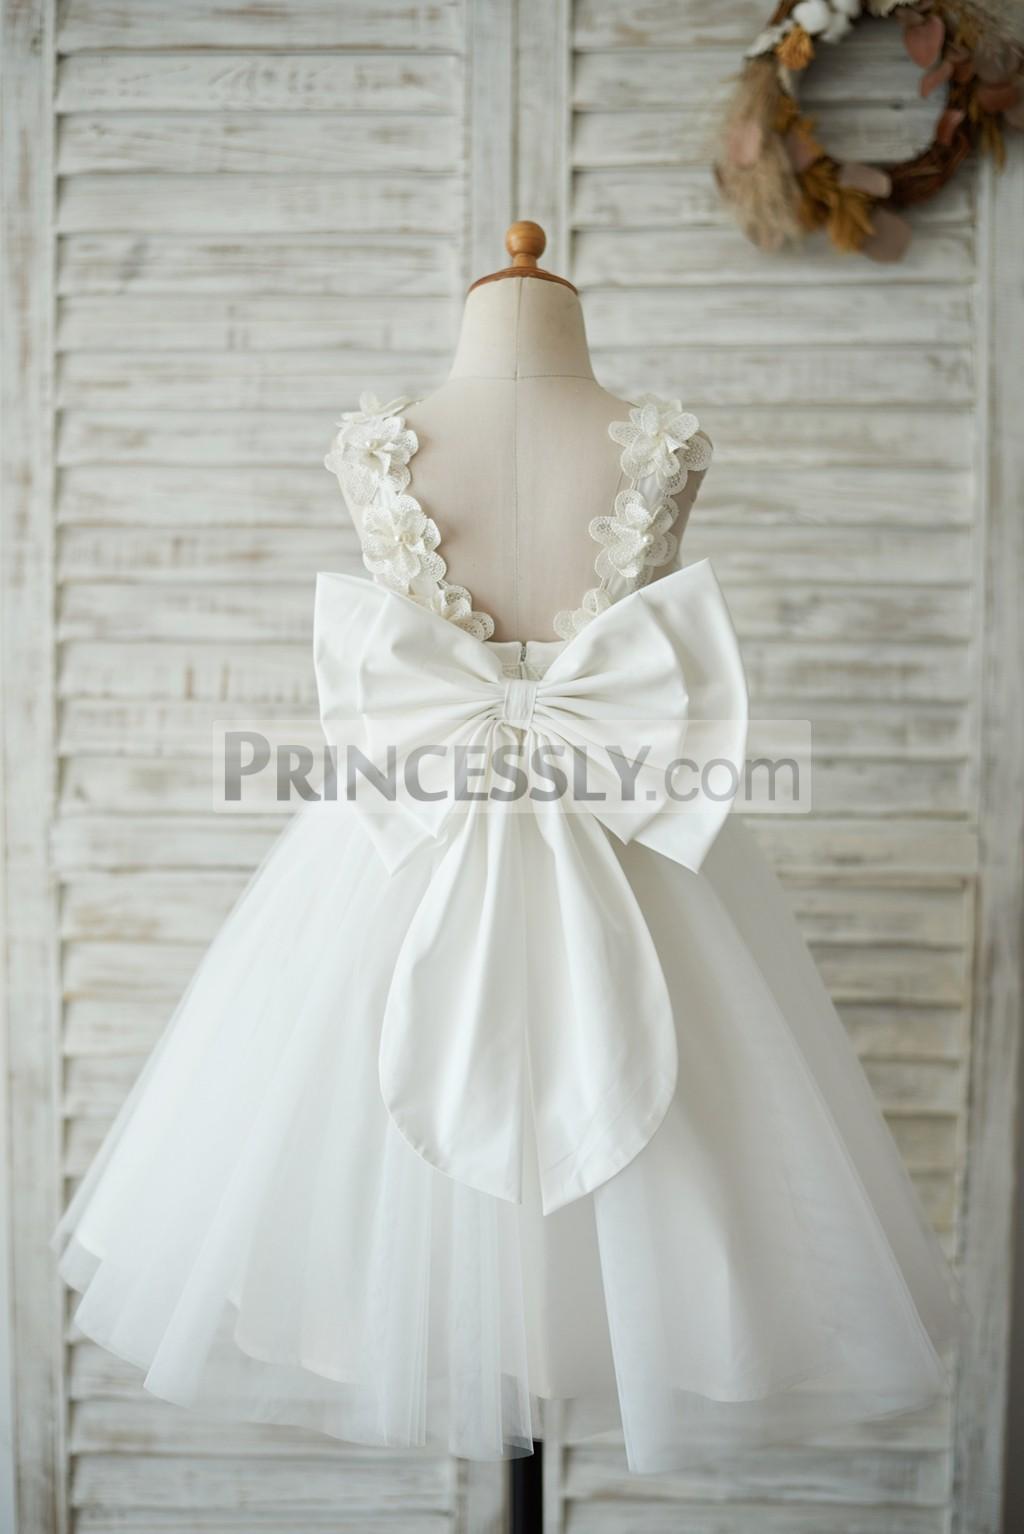 Princessly.com-K1003541-Princess Ivory Lace Tulle V Back Wedding Flower Girl Dress with Big Bow-31